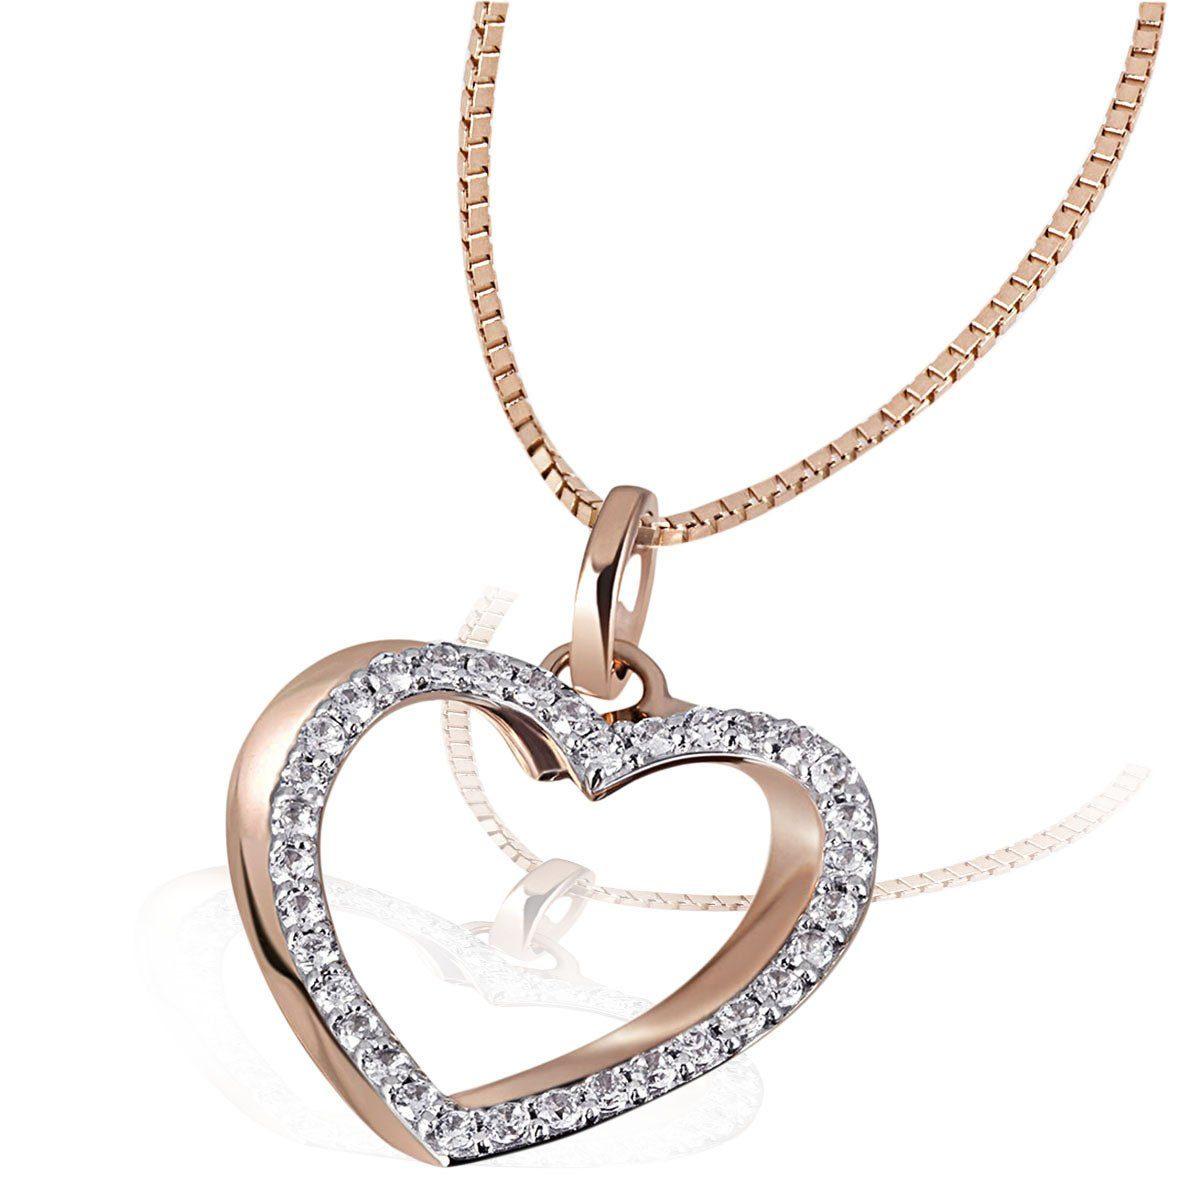 goldmaid Collier Heart 585 Rotgold 34 Diamanten 0,23 ct. P2/H